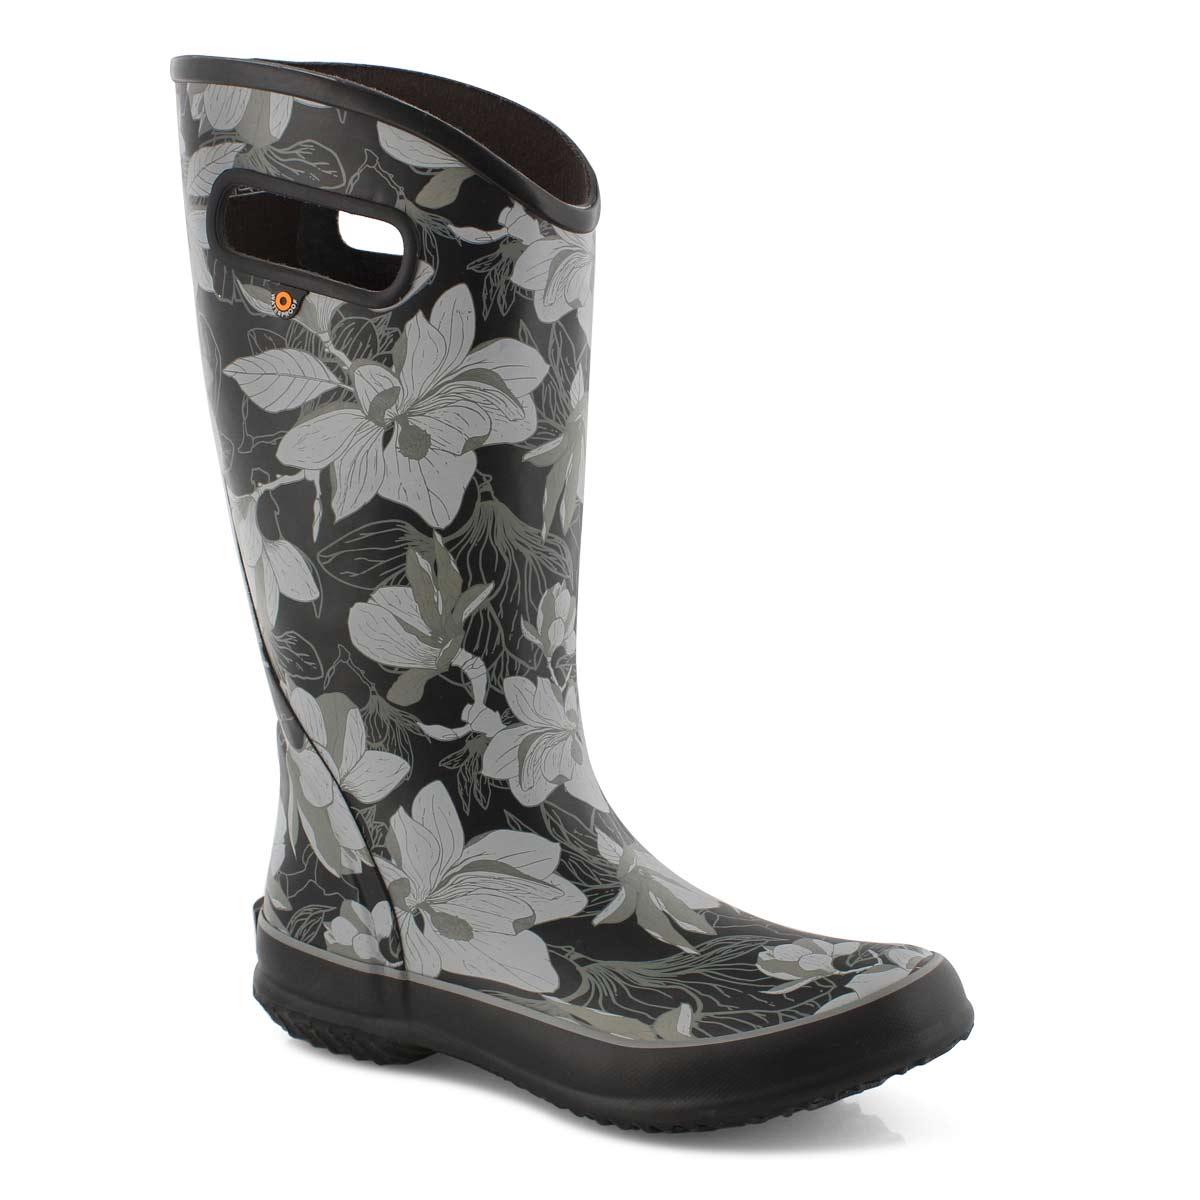 Lds Spring Vintage black multi rain boot